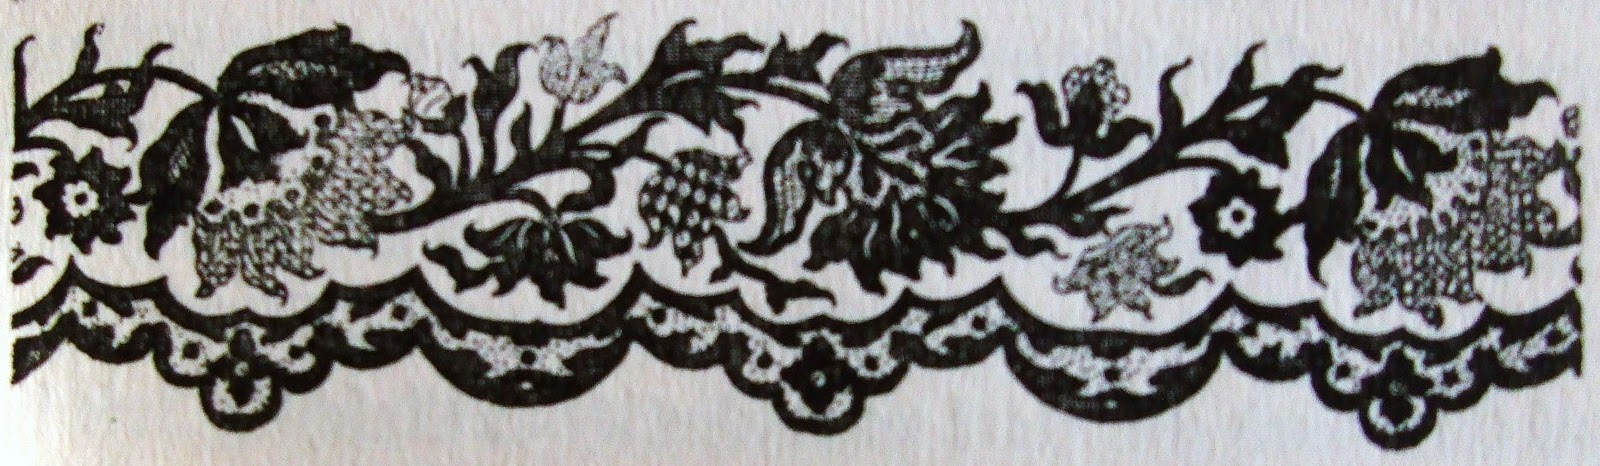 Орнамент 1745 года